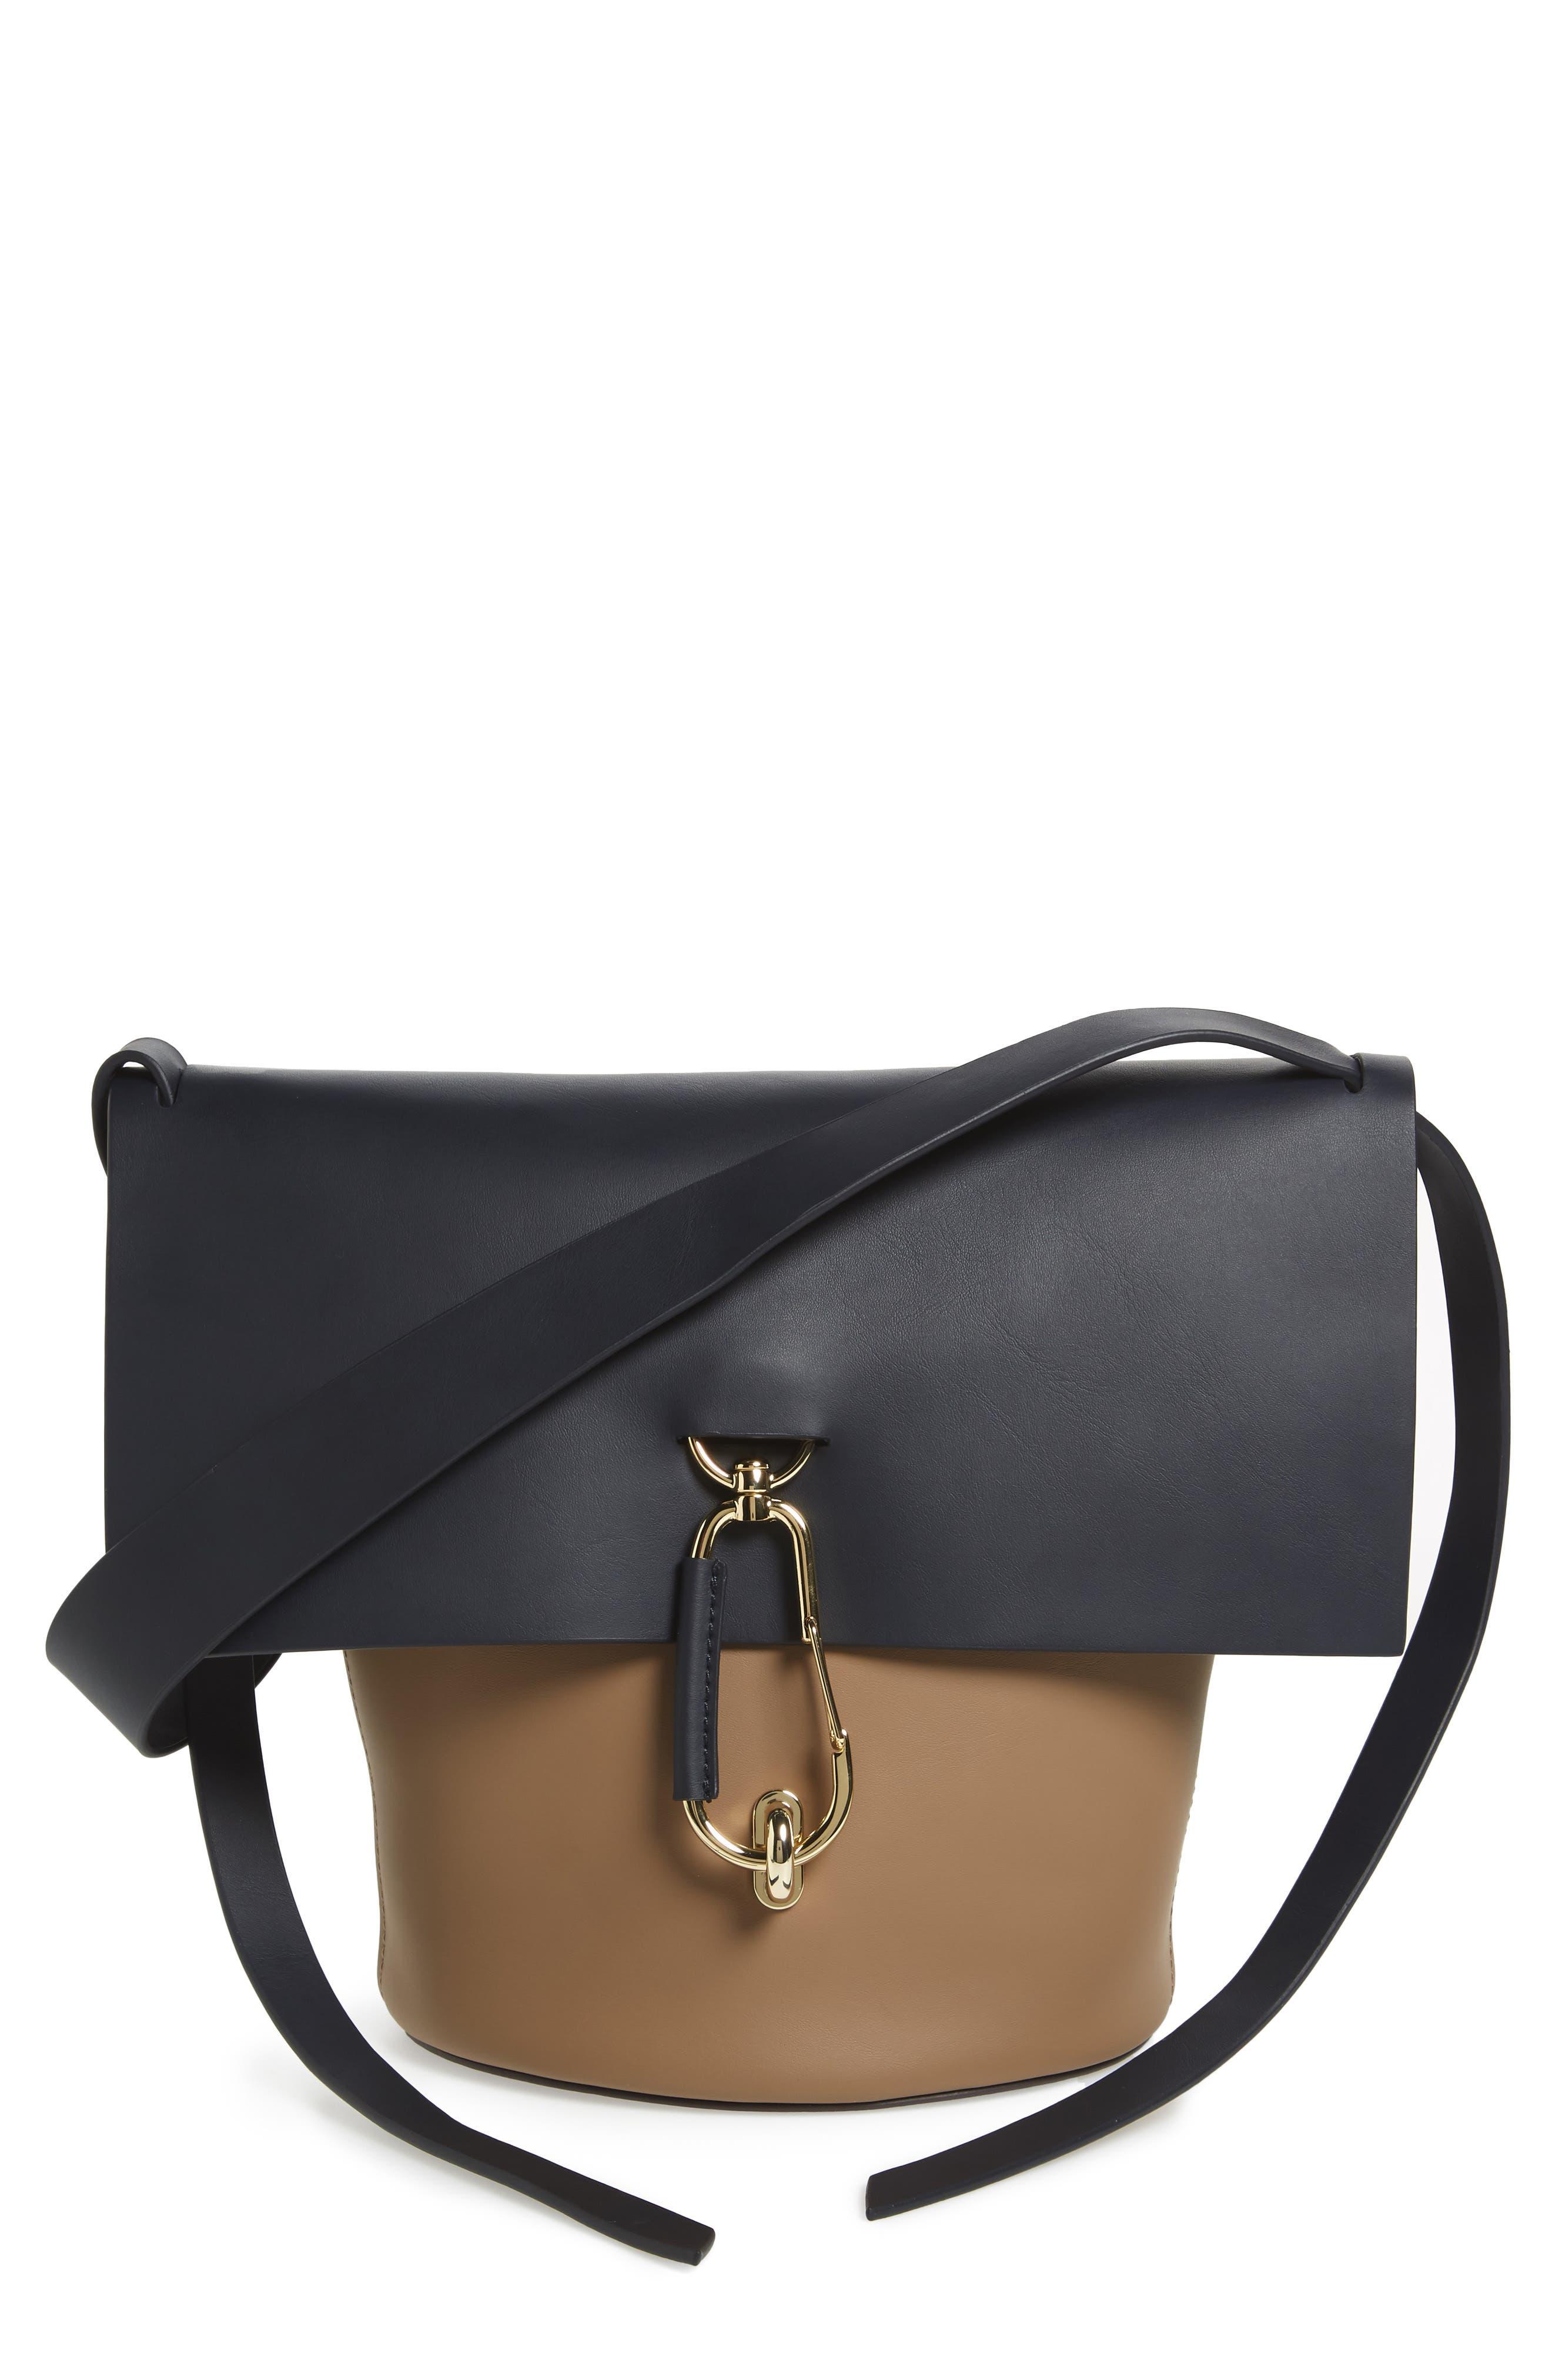 Belay Colorblock Calfskin Leather Bucket Bag,                             Main thumbnail 1, color,                             400